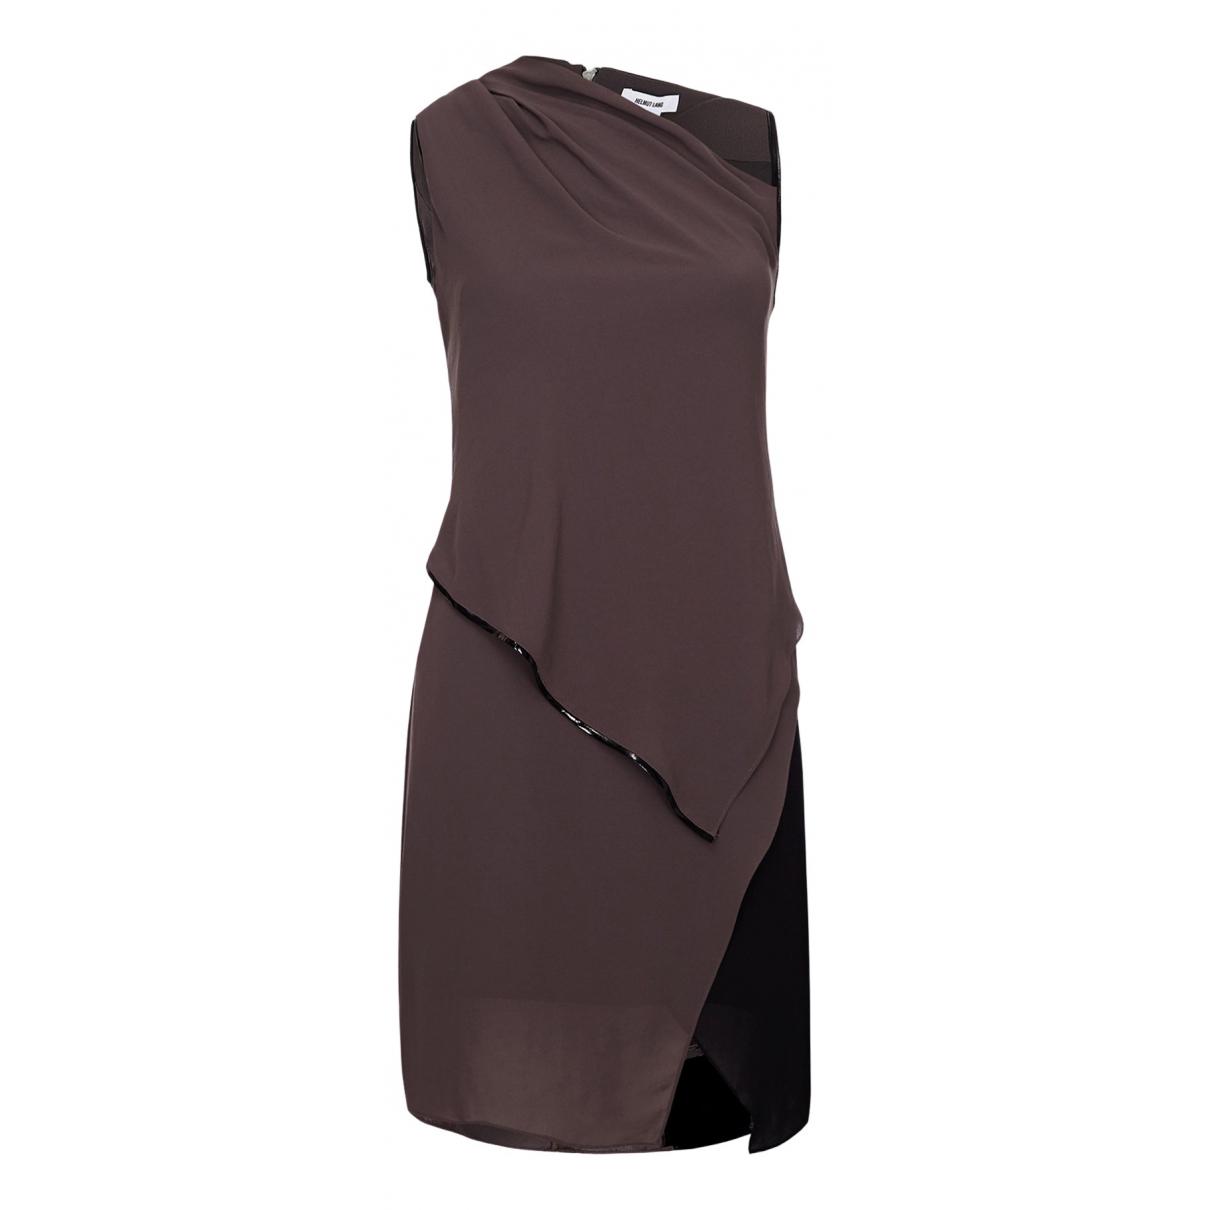 Helmut Lang N Brown Cotton dress for Women 6 UK